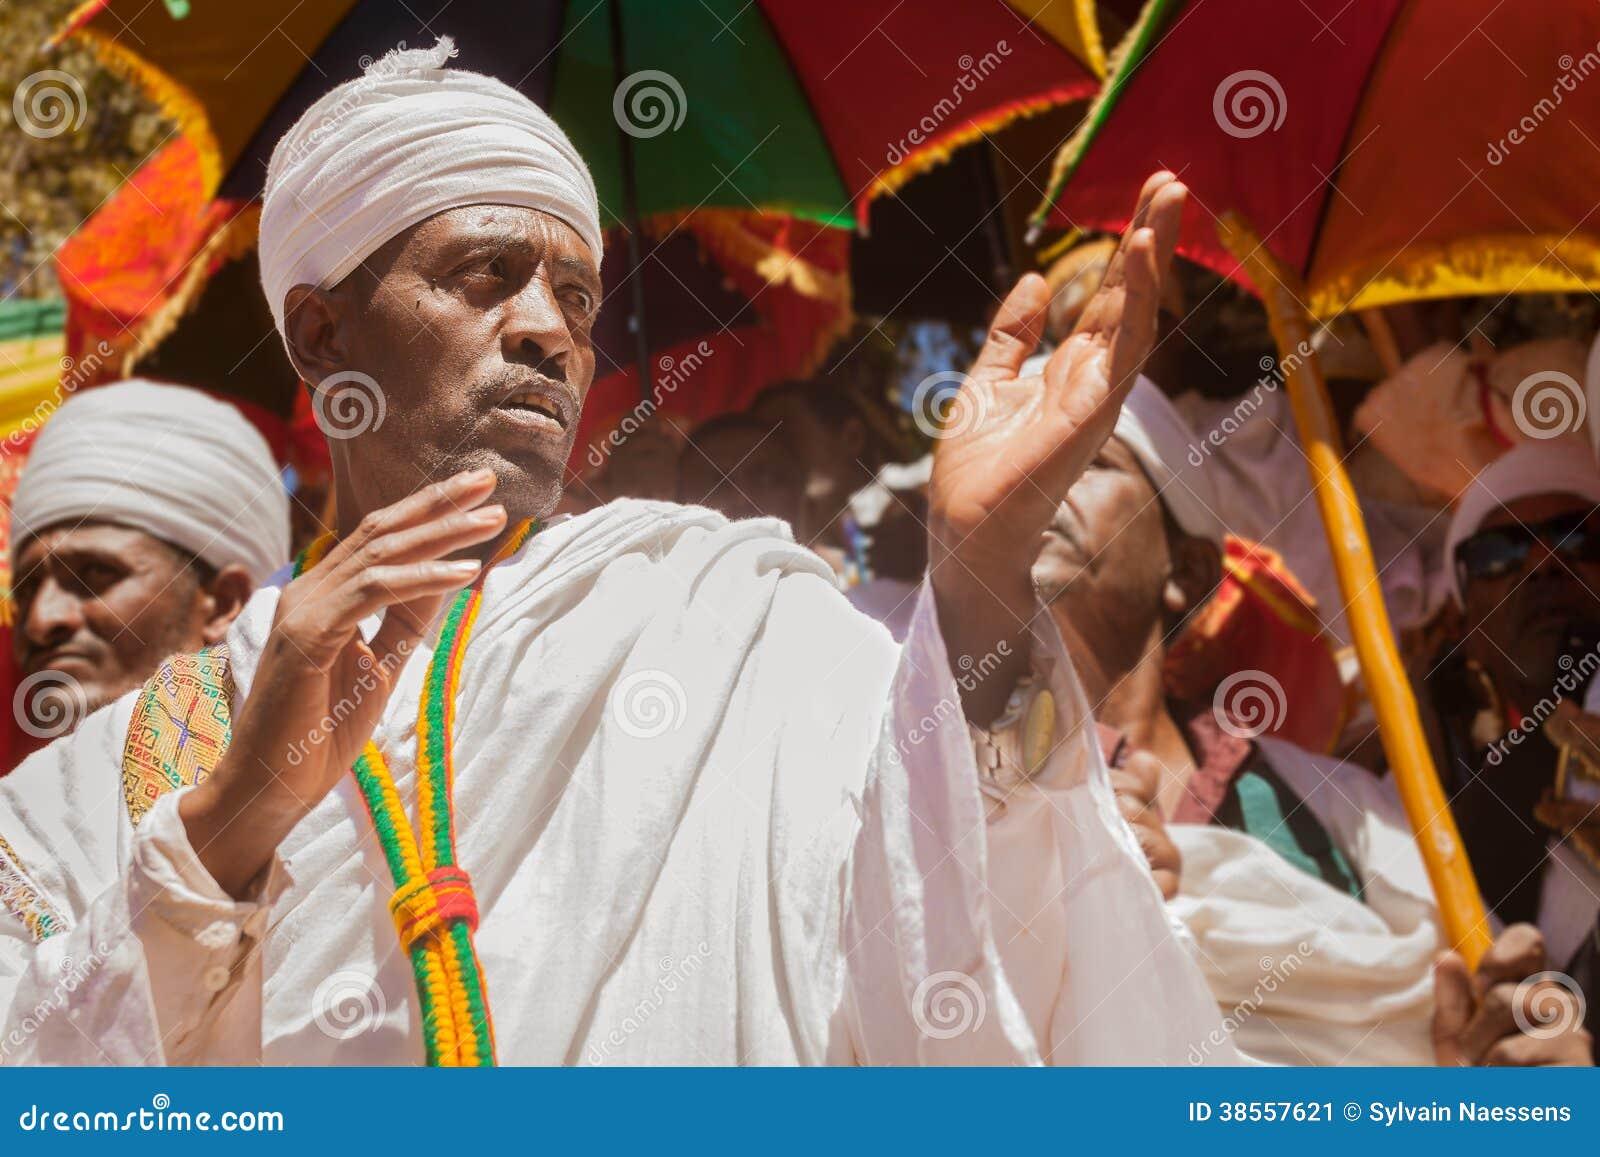 Orthodox priest during Timkat festival at Lalibela in Ethiopia